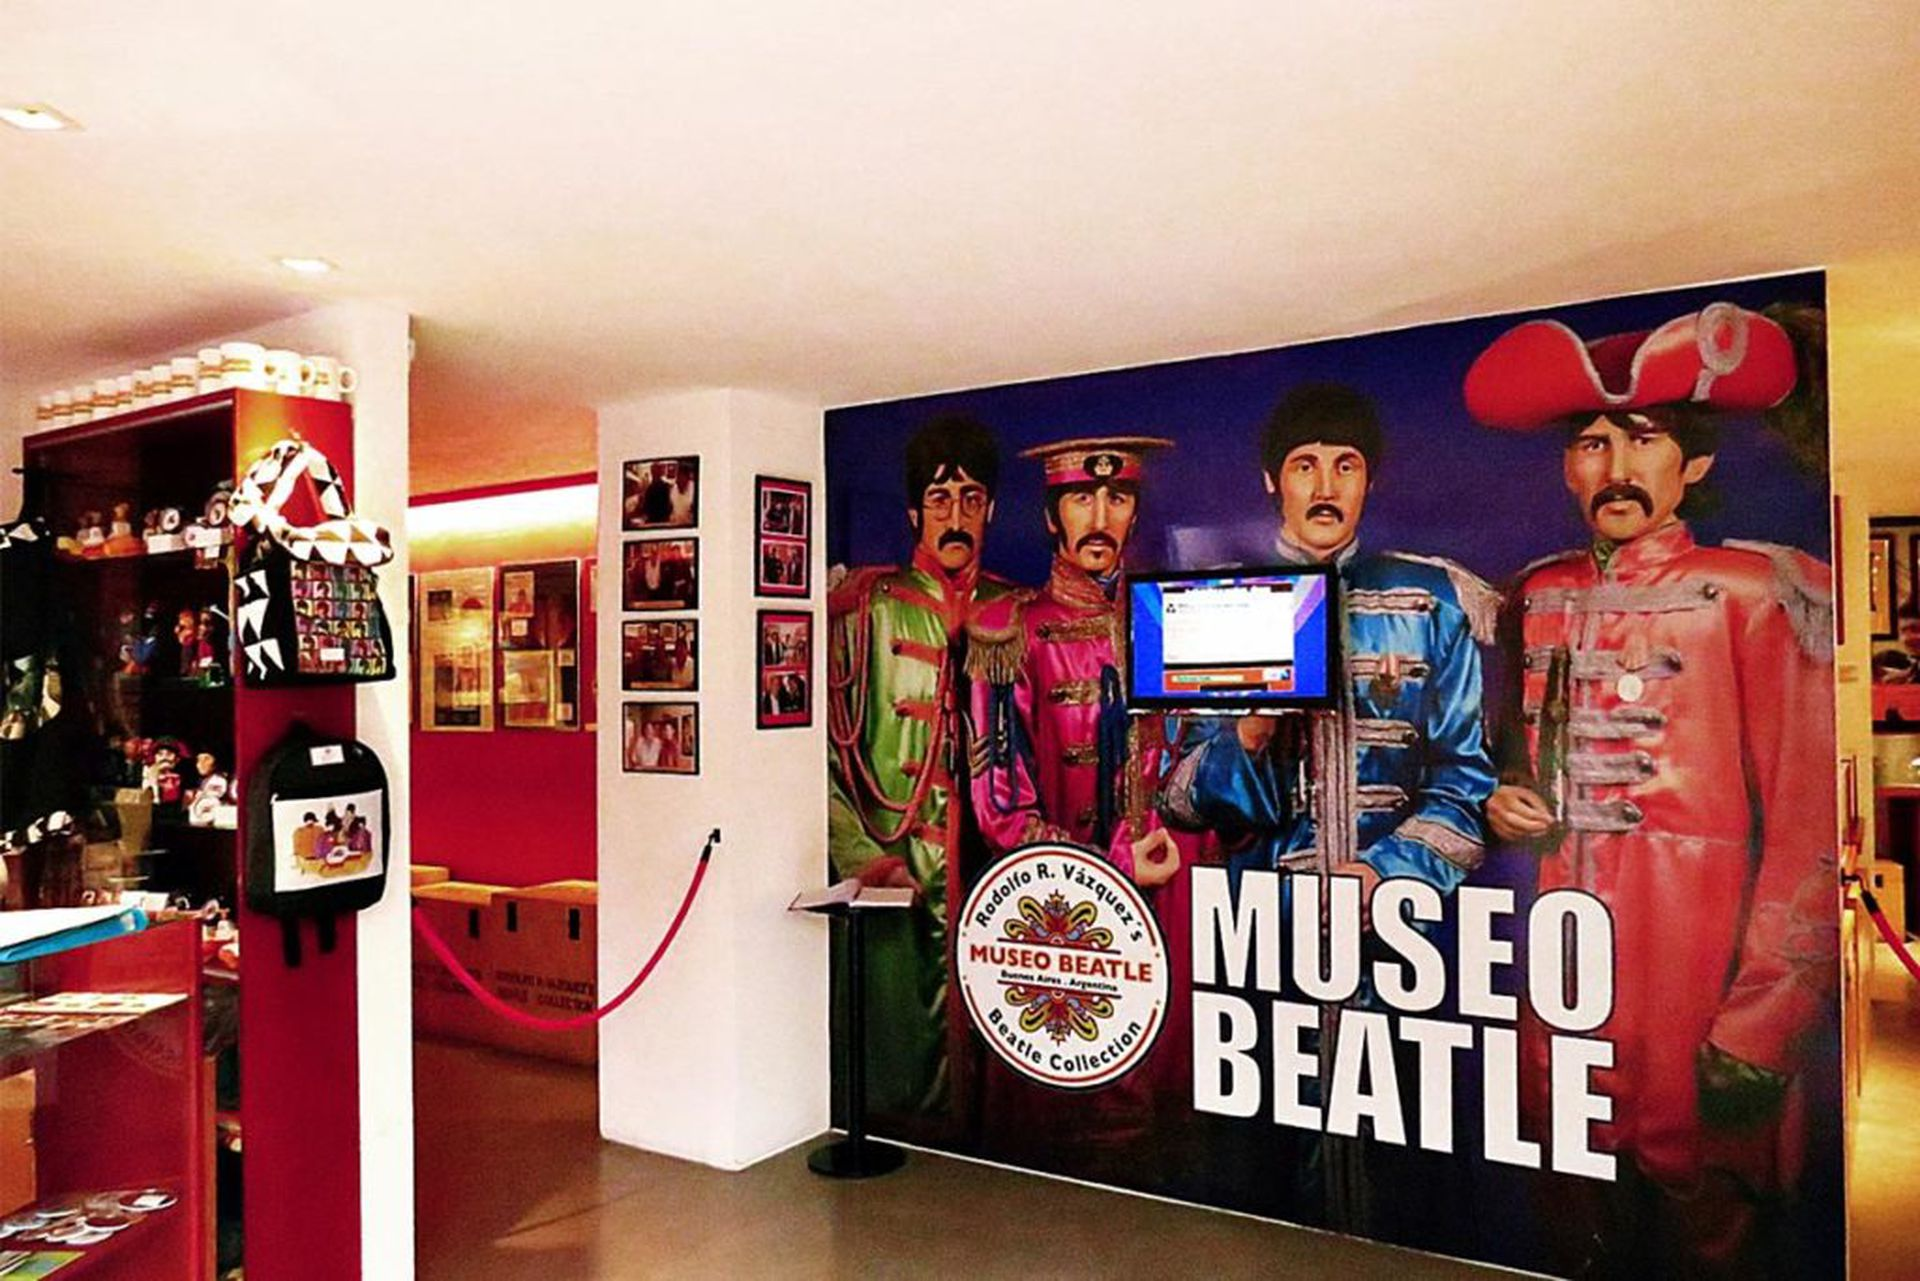 Museo Beatle Buenos Aires a pasos de la calle Corrientes.